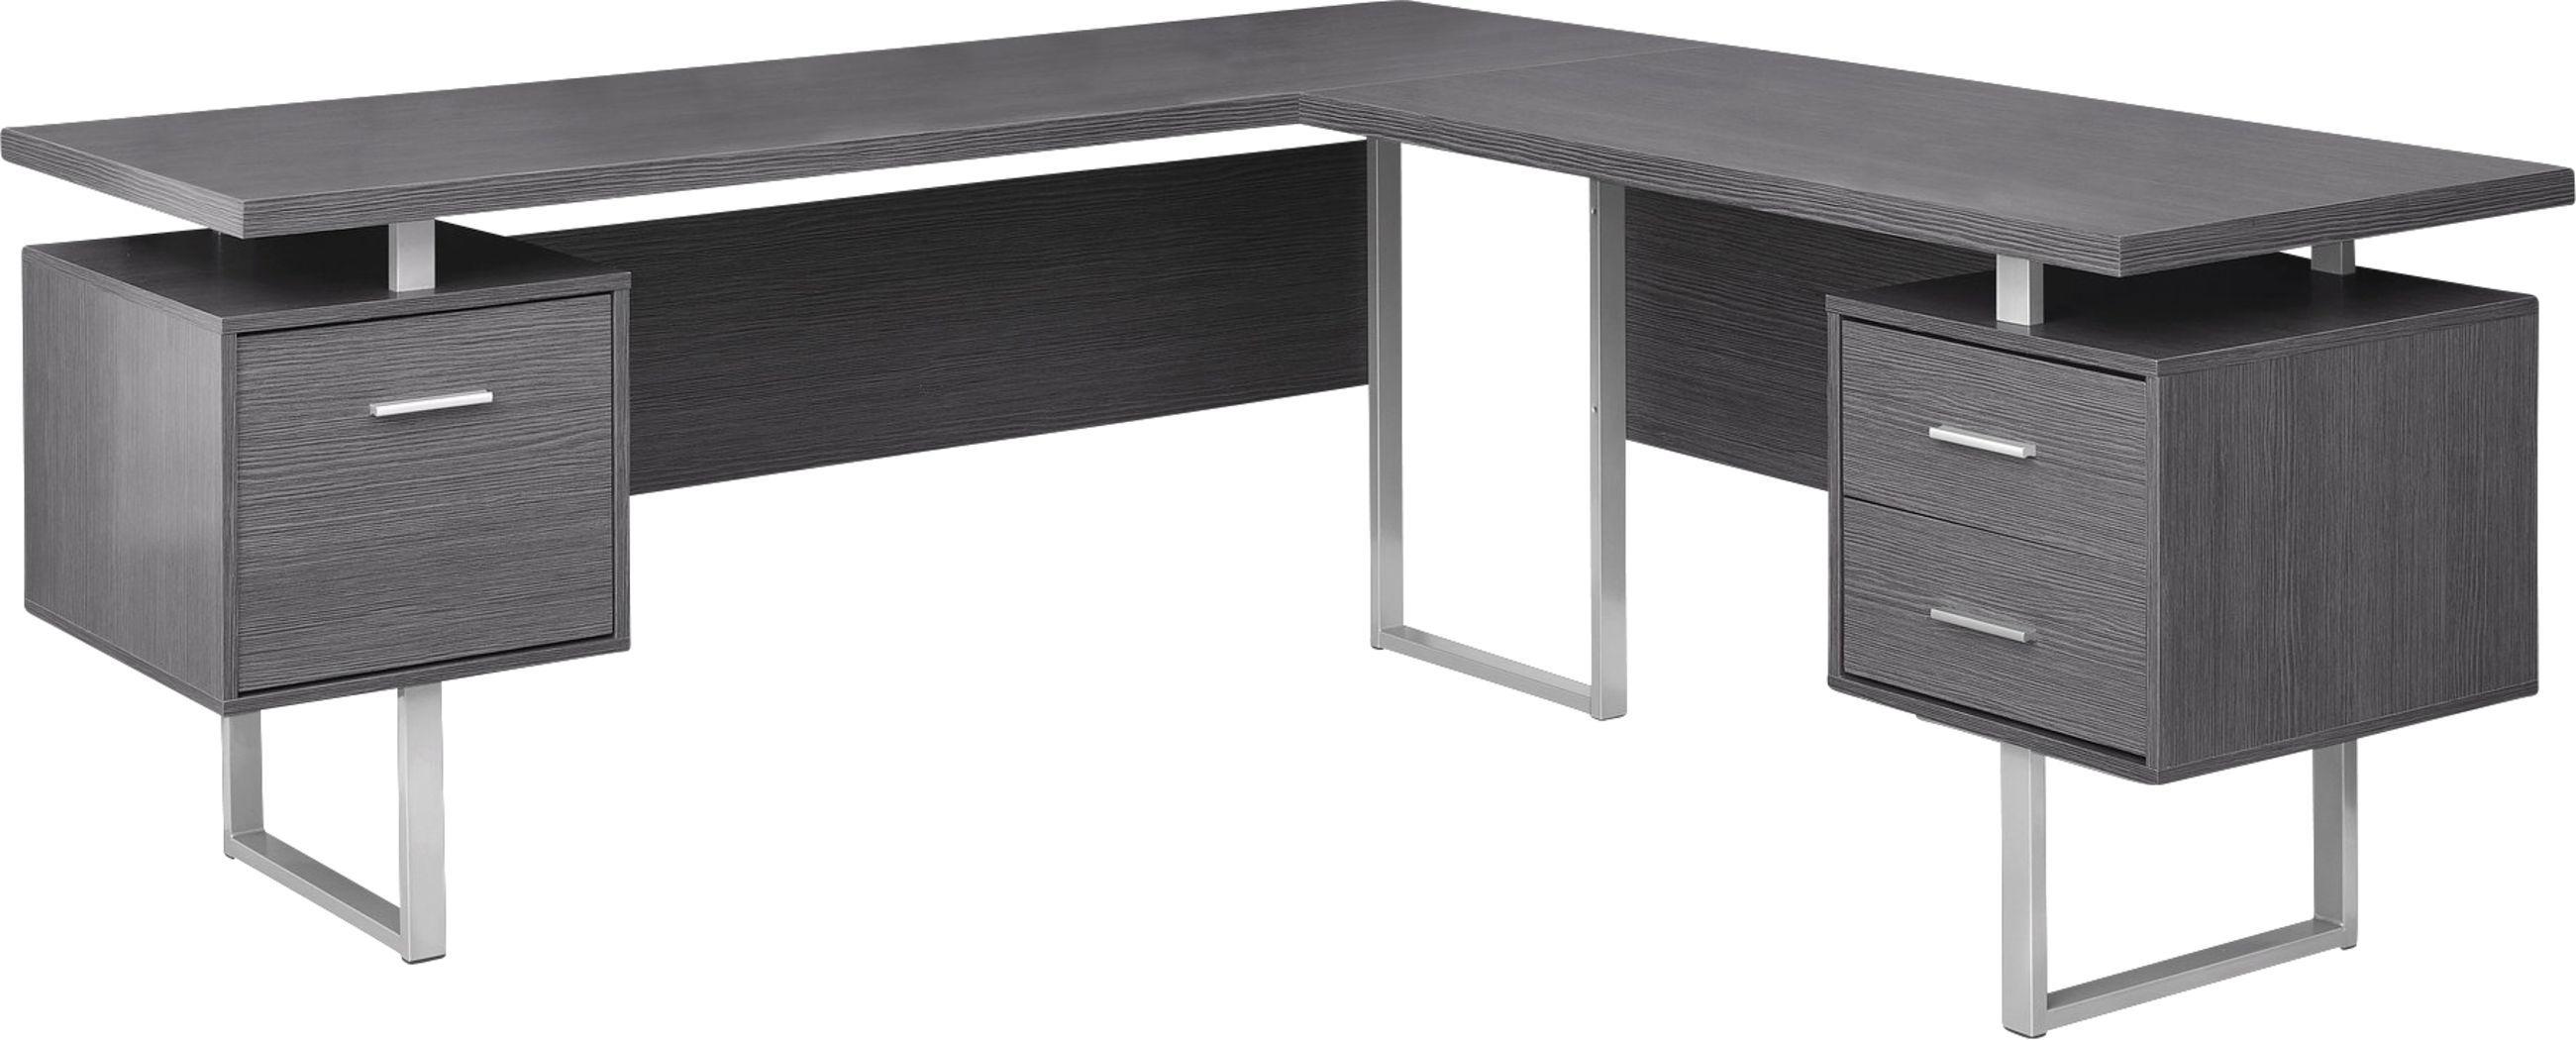 Wellyn Gray Desk Corner Desk Grey Desk L Shaped Corner Desk